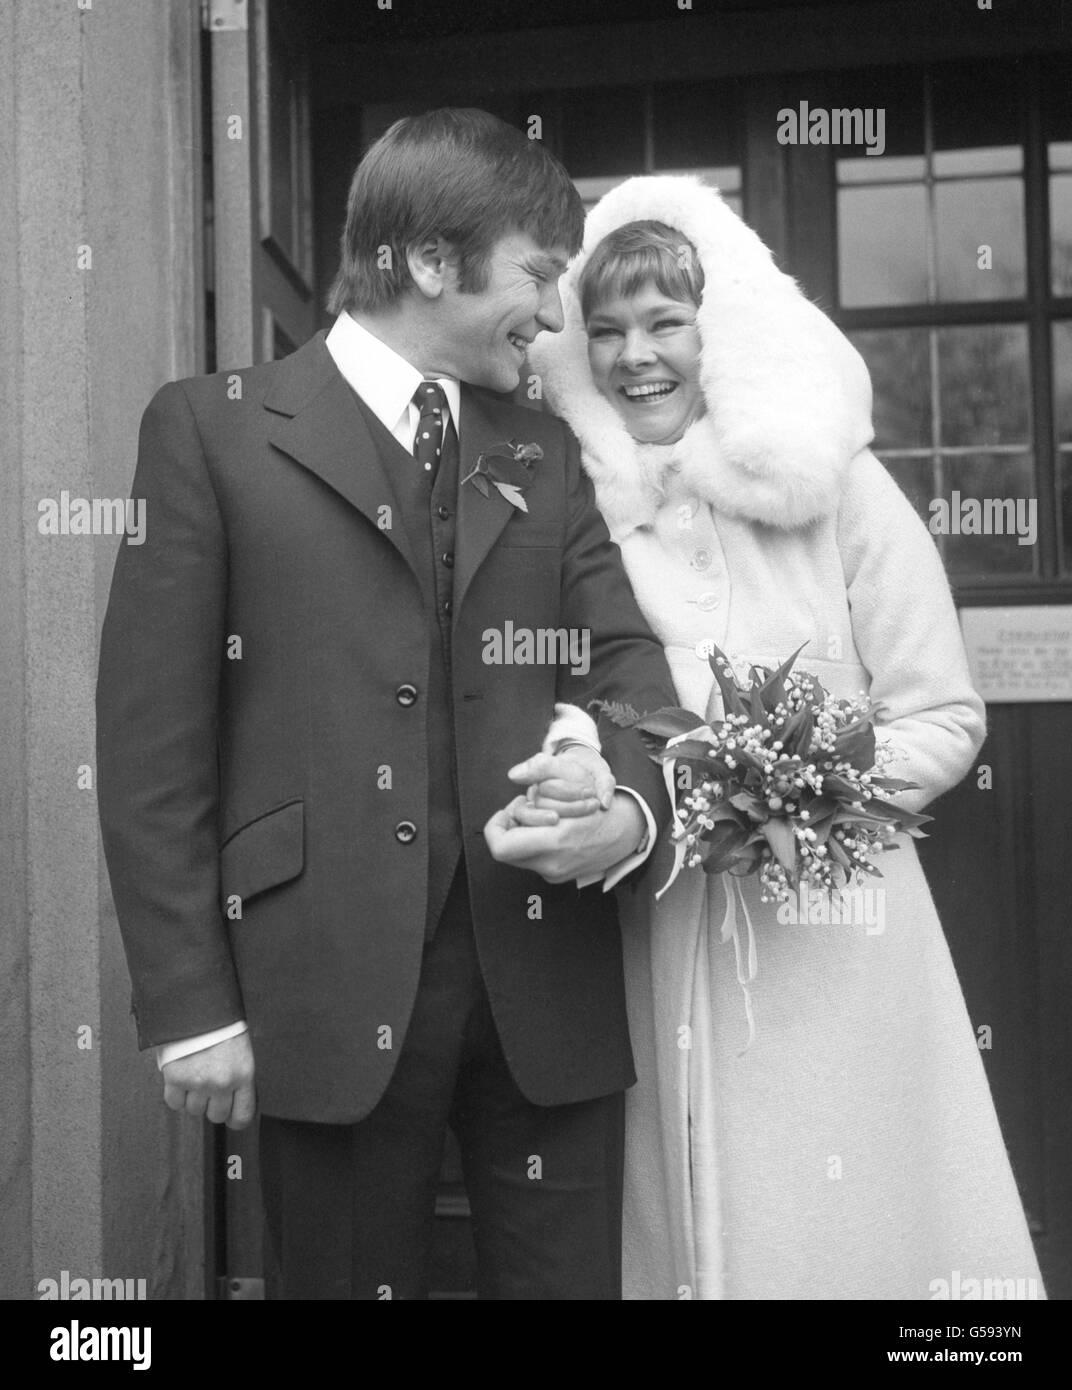 Michael Williams and Judi Dench Wedding Stock Photo